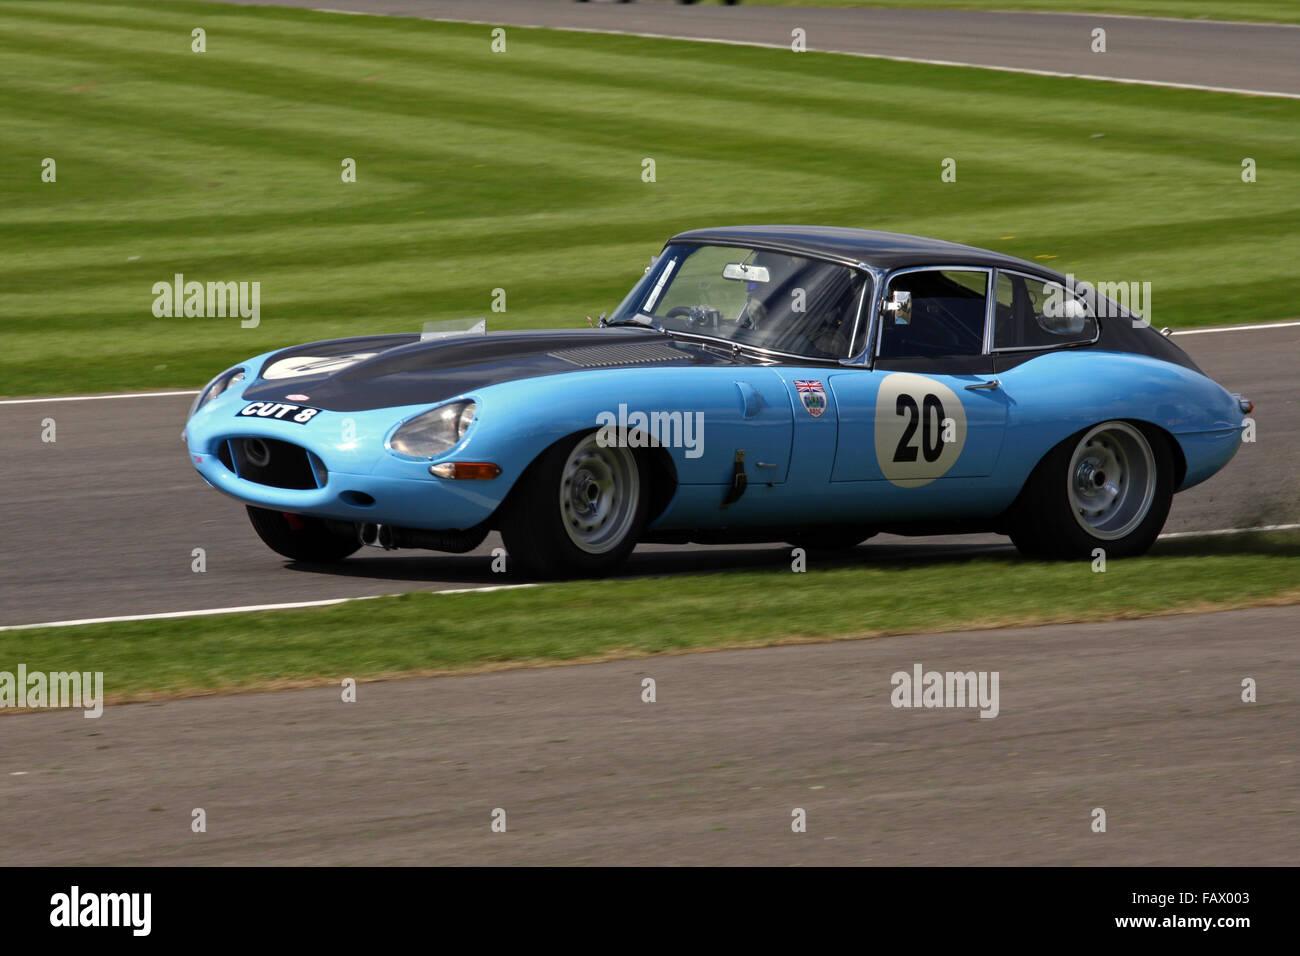 RAC TT Celebration race. No 20 Gregor Fiskin & Bobby Verdon-Roe Jaguar E-type FHC in a spin at Goodwood Revival - Stock Image